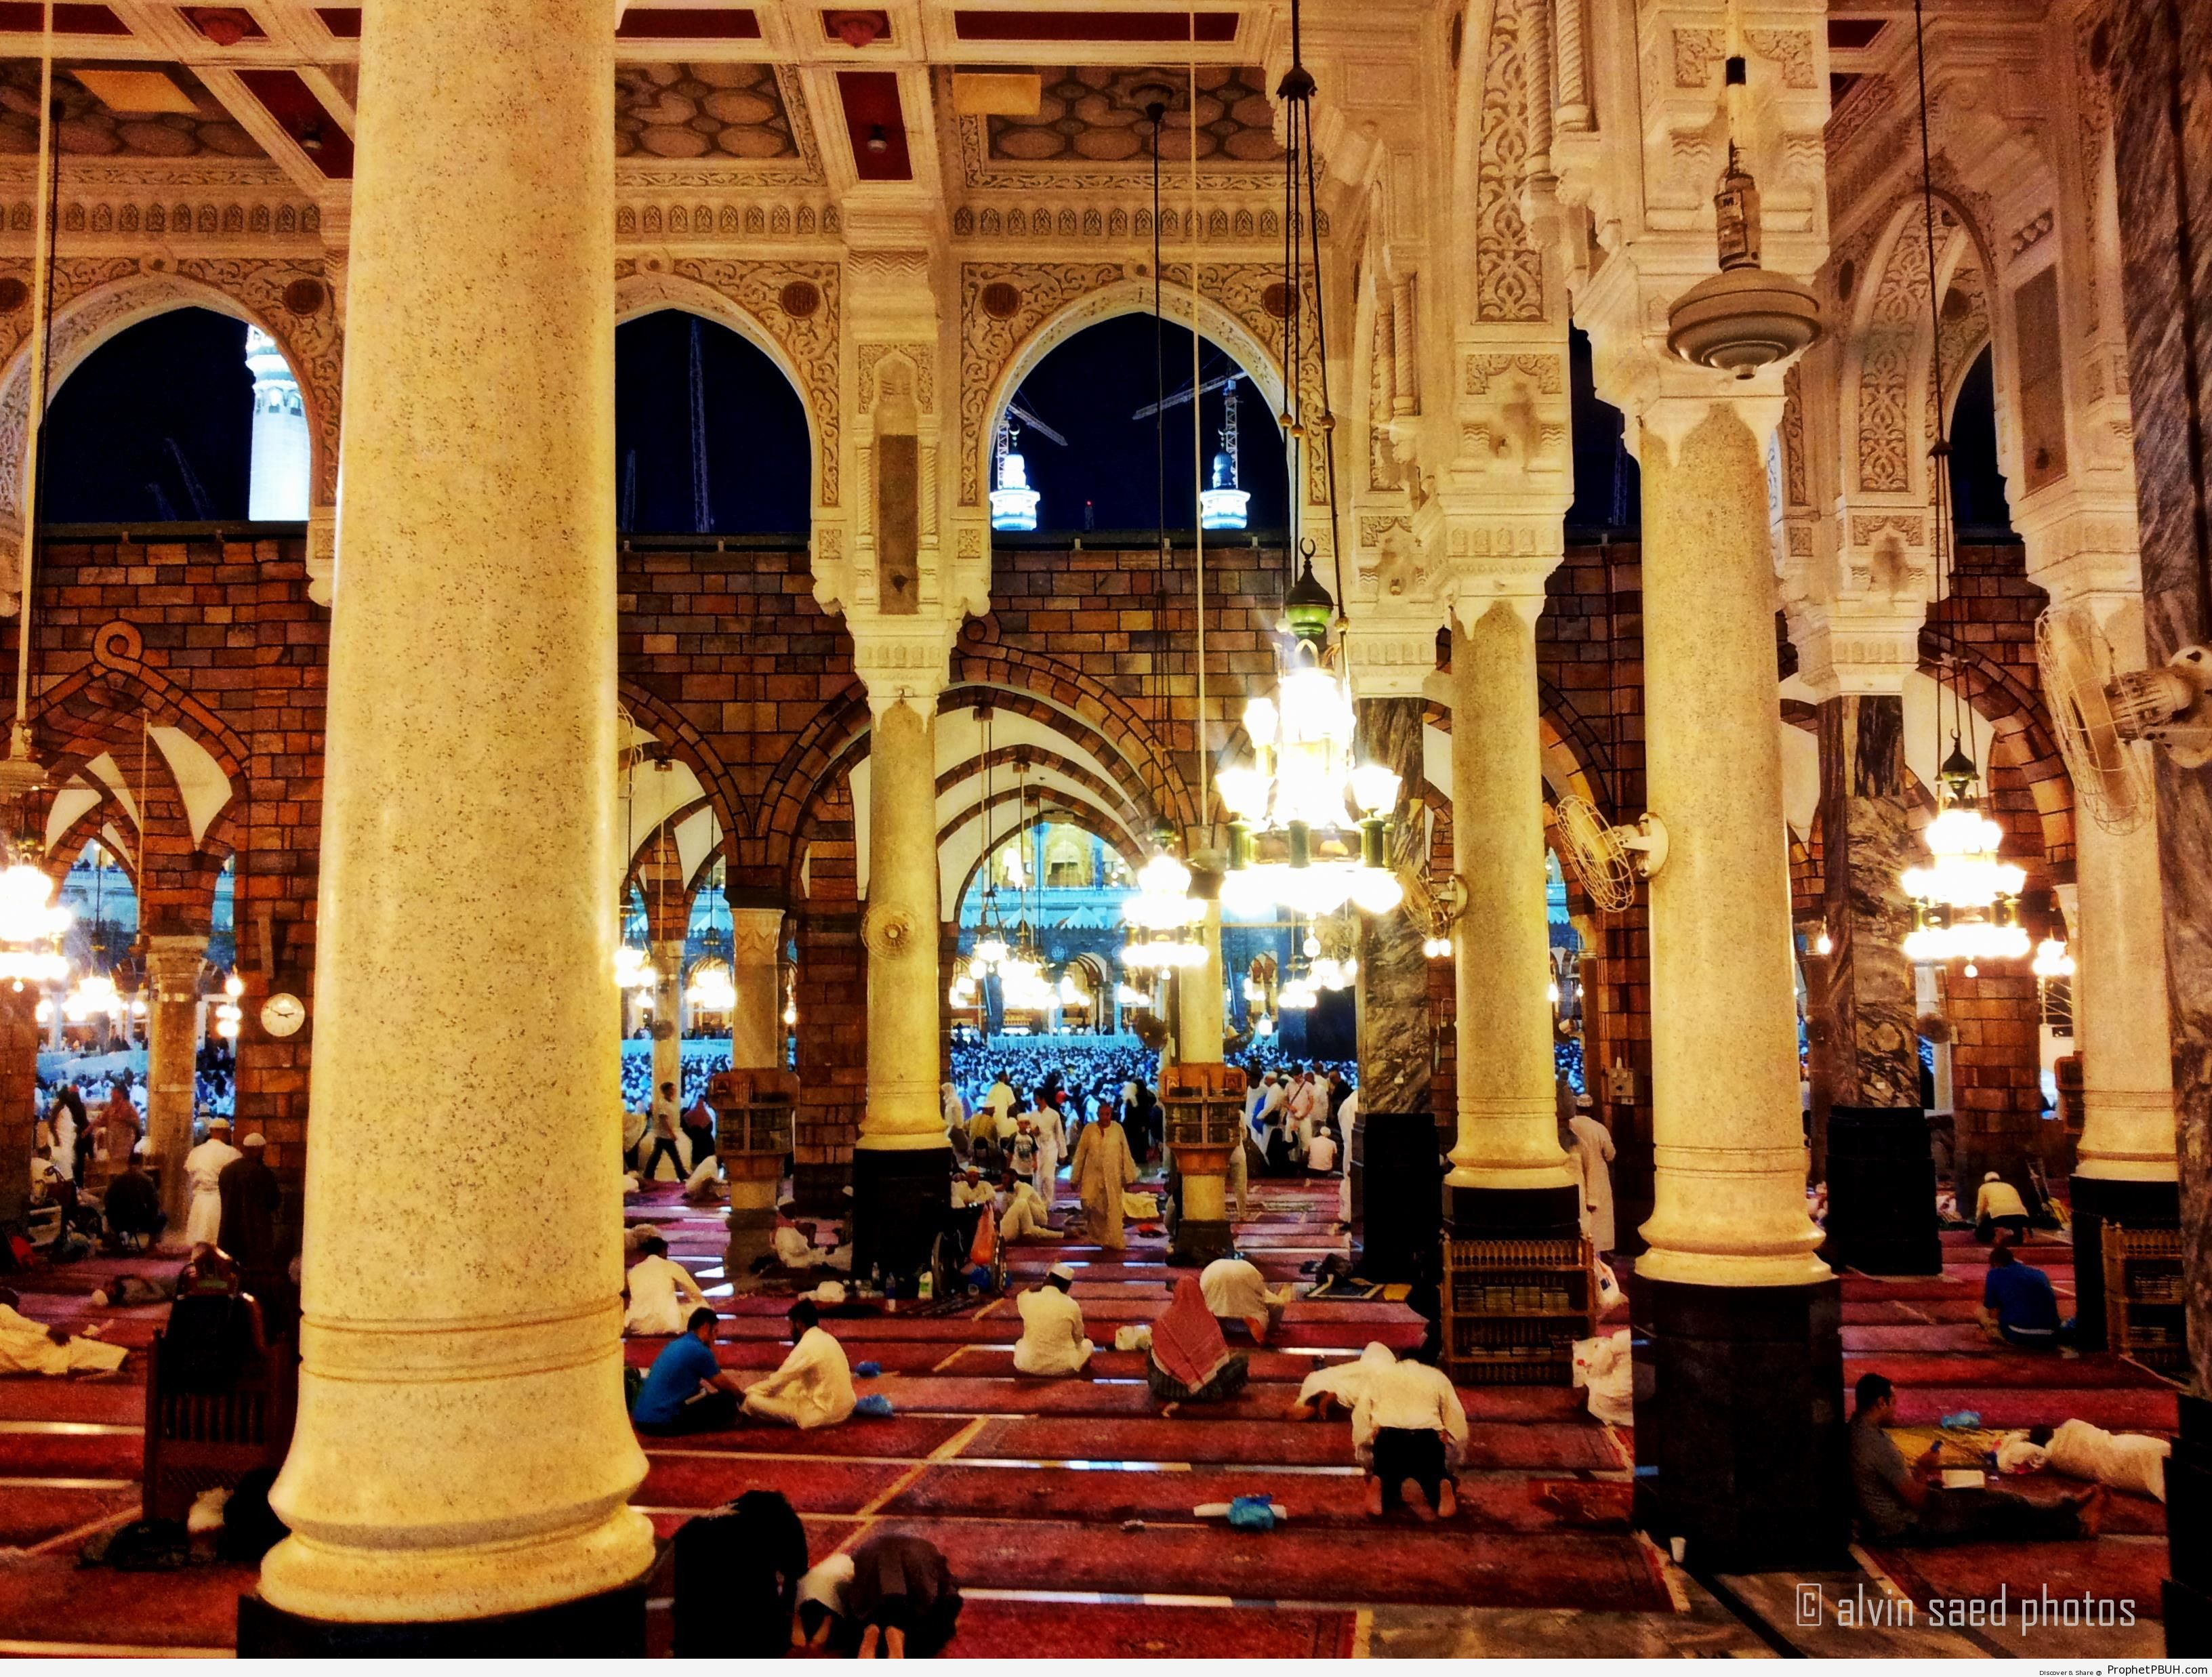 Inside Masjid al-Haram - al-Masjid al-Haram in Makkah, Saudi Arabia -Picture